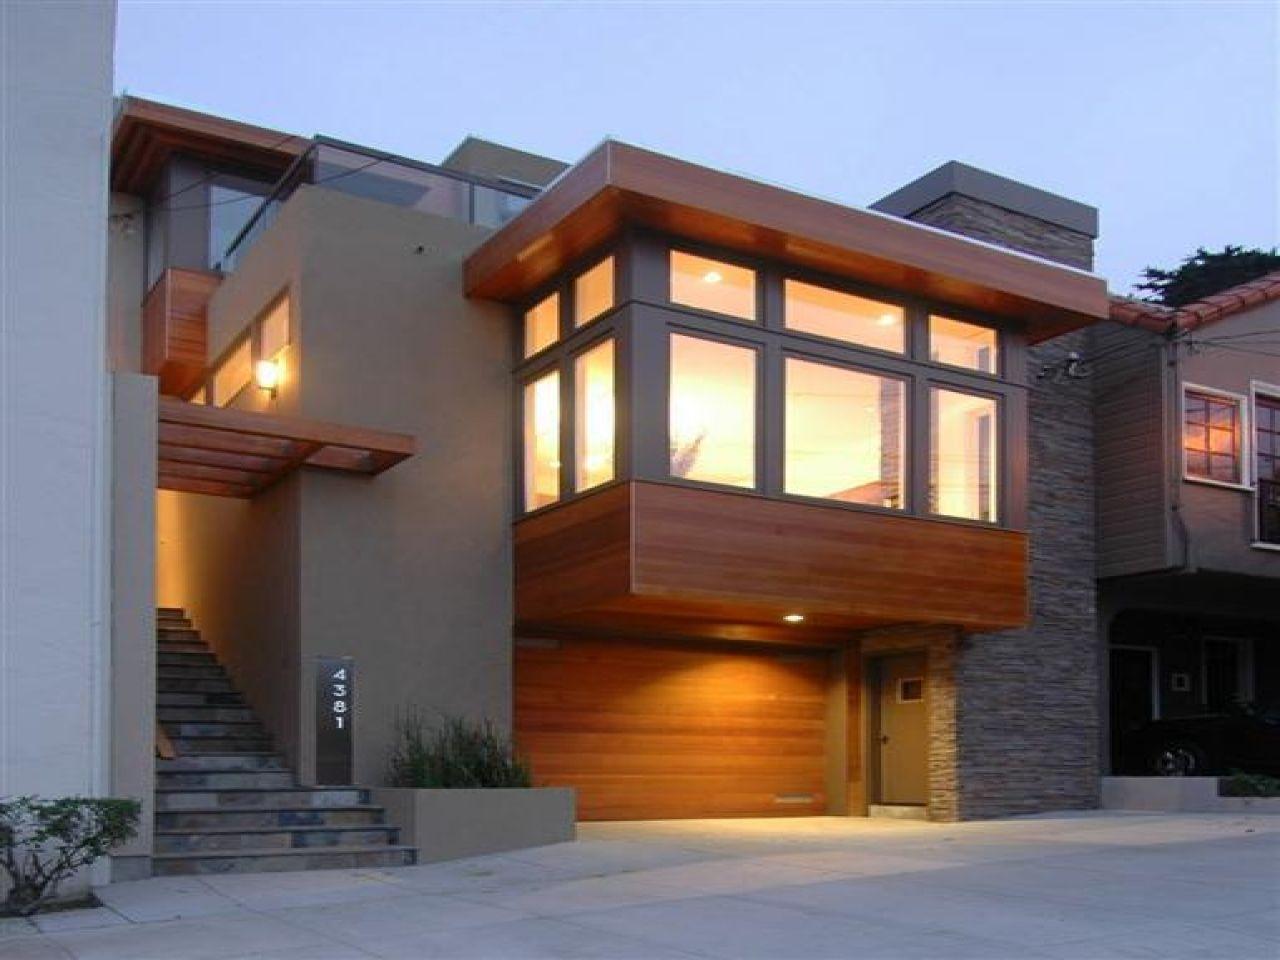 Image result for modern home stucco wood trim exterior